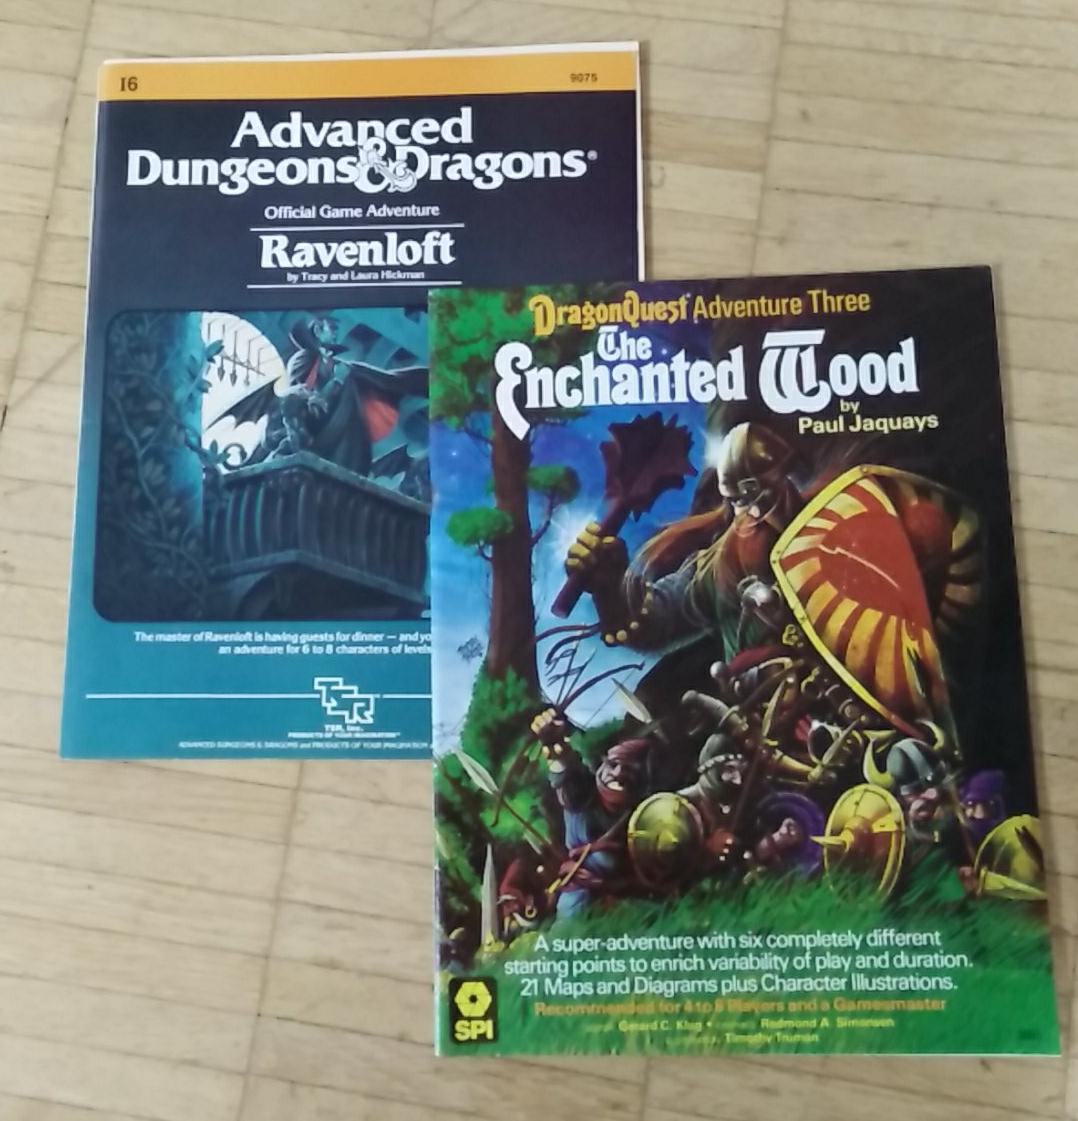 Dragonquest: The Enchanted Wood and AD&D: I6 - Ravenloft (Image: obskures.de Covers: SPI, TSR)